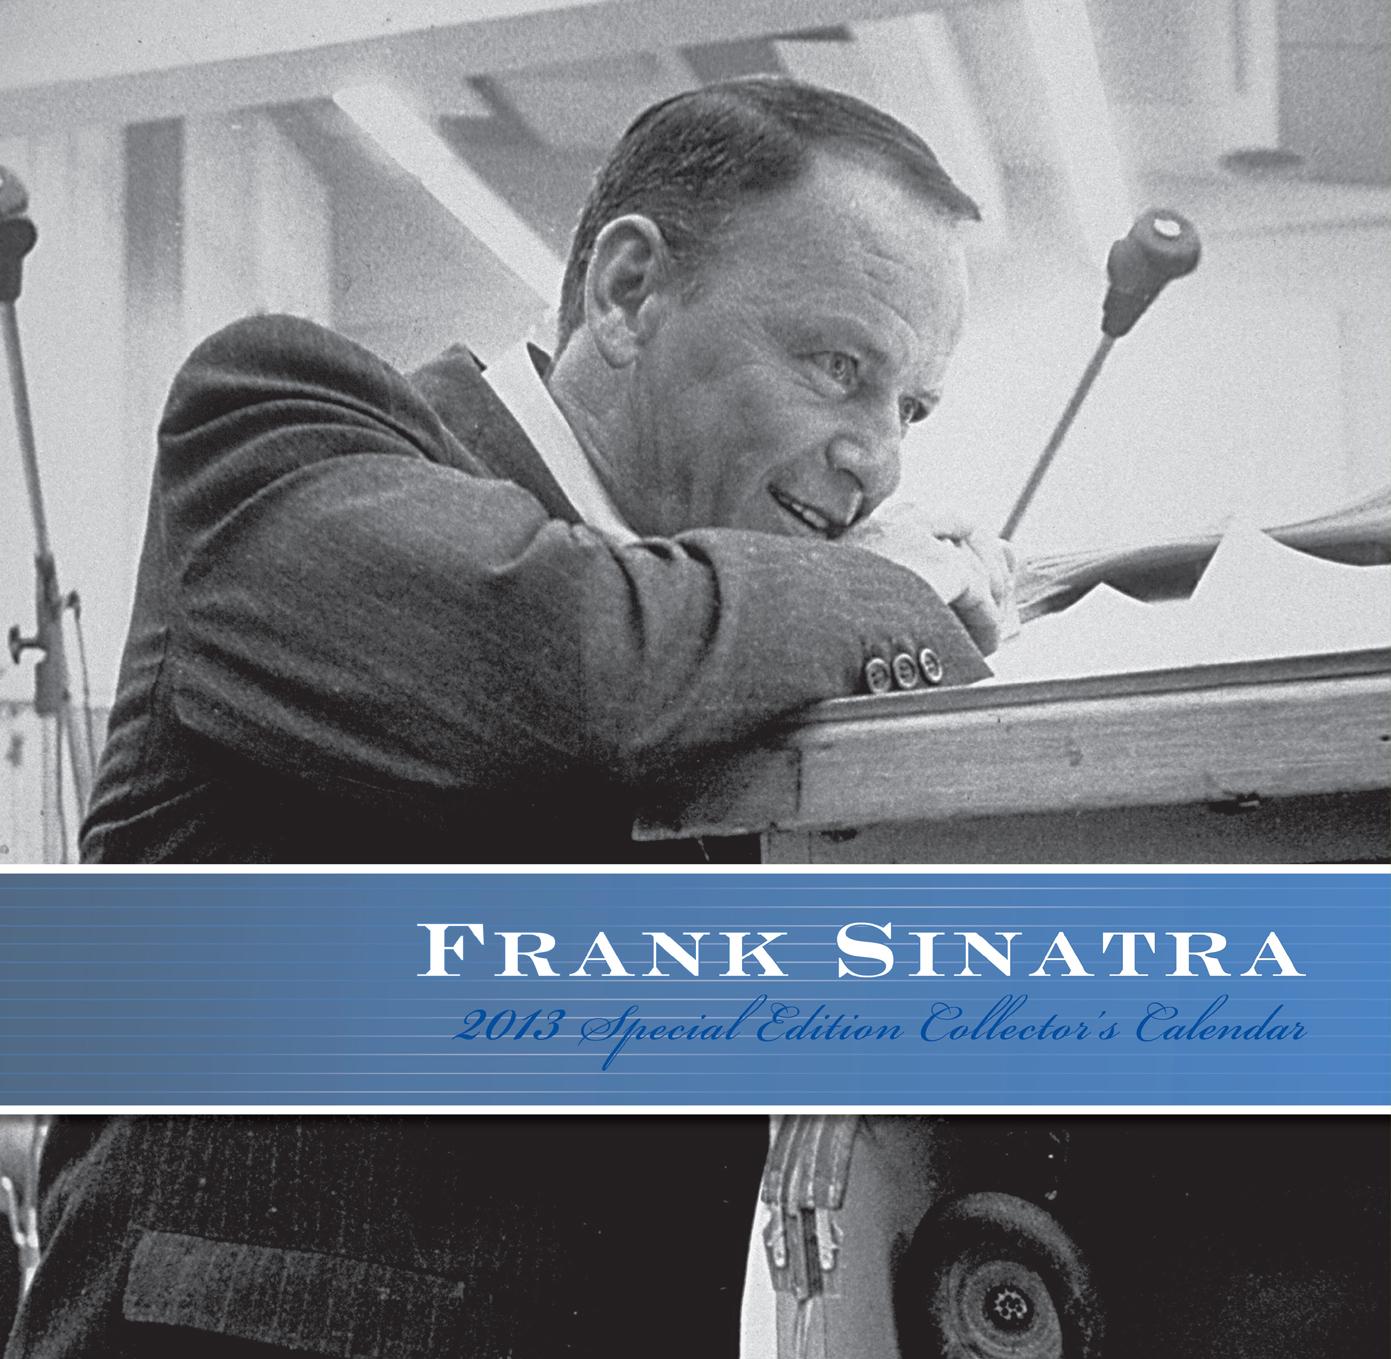 2014 Frank Sinatra cover.jpg